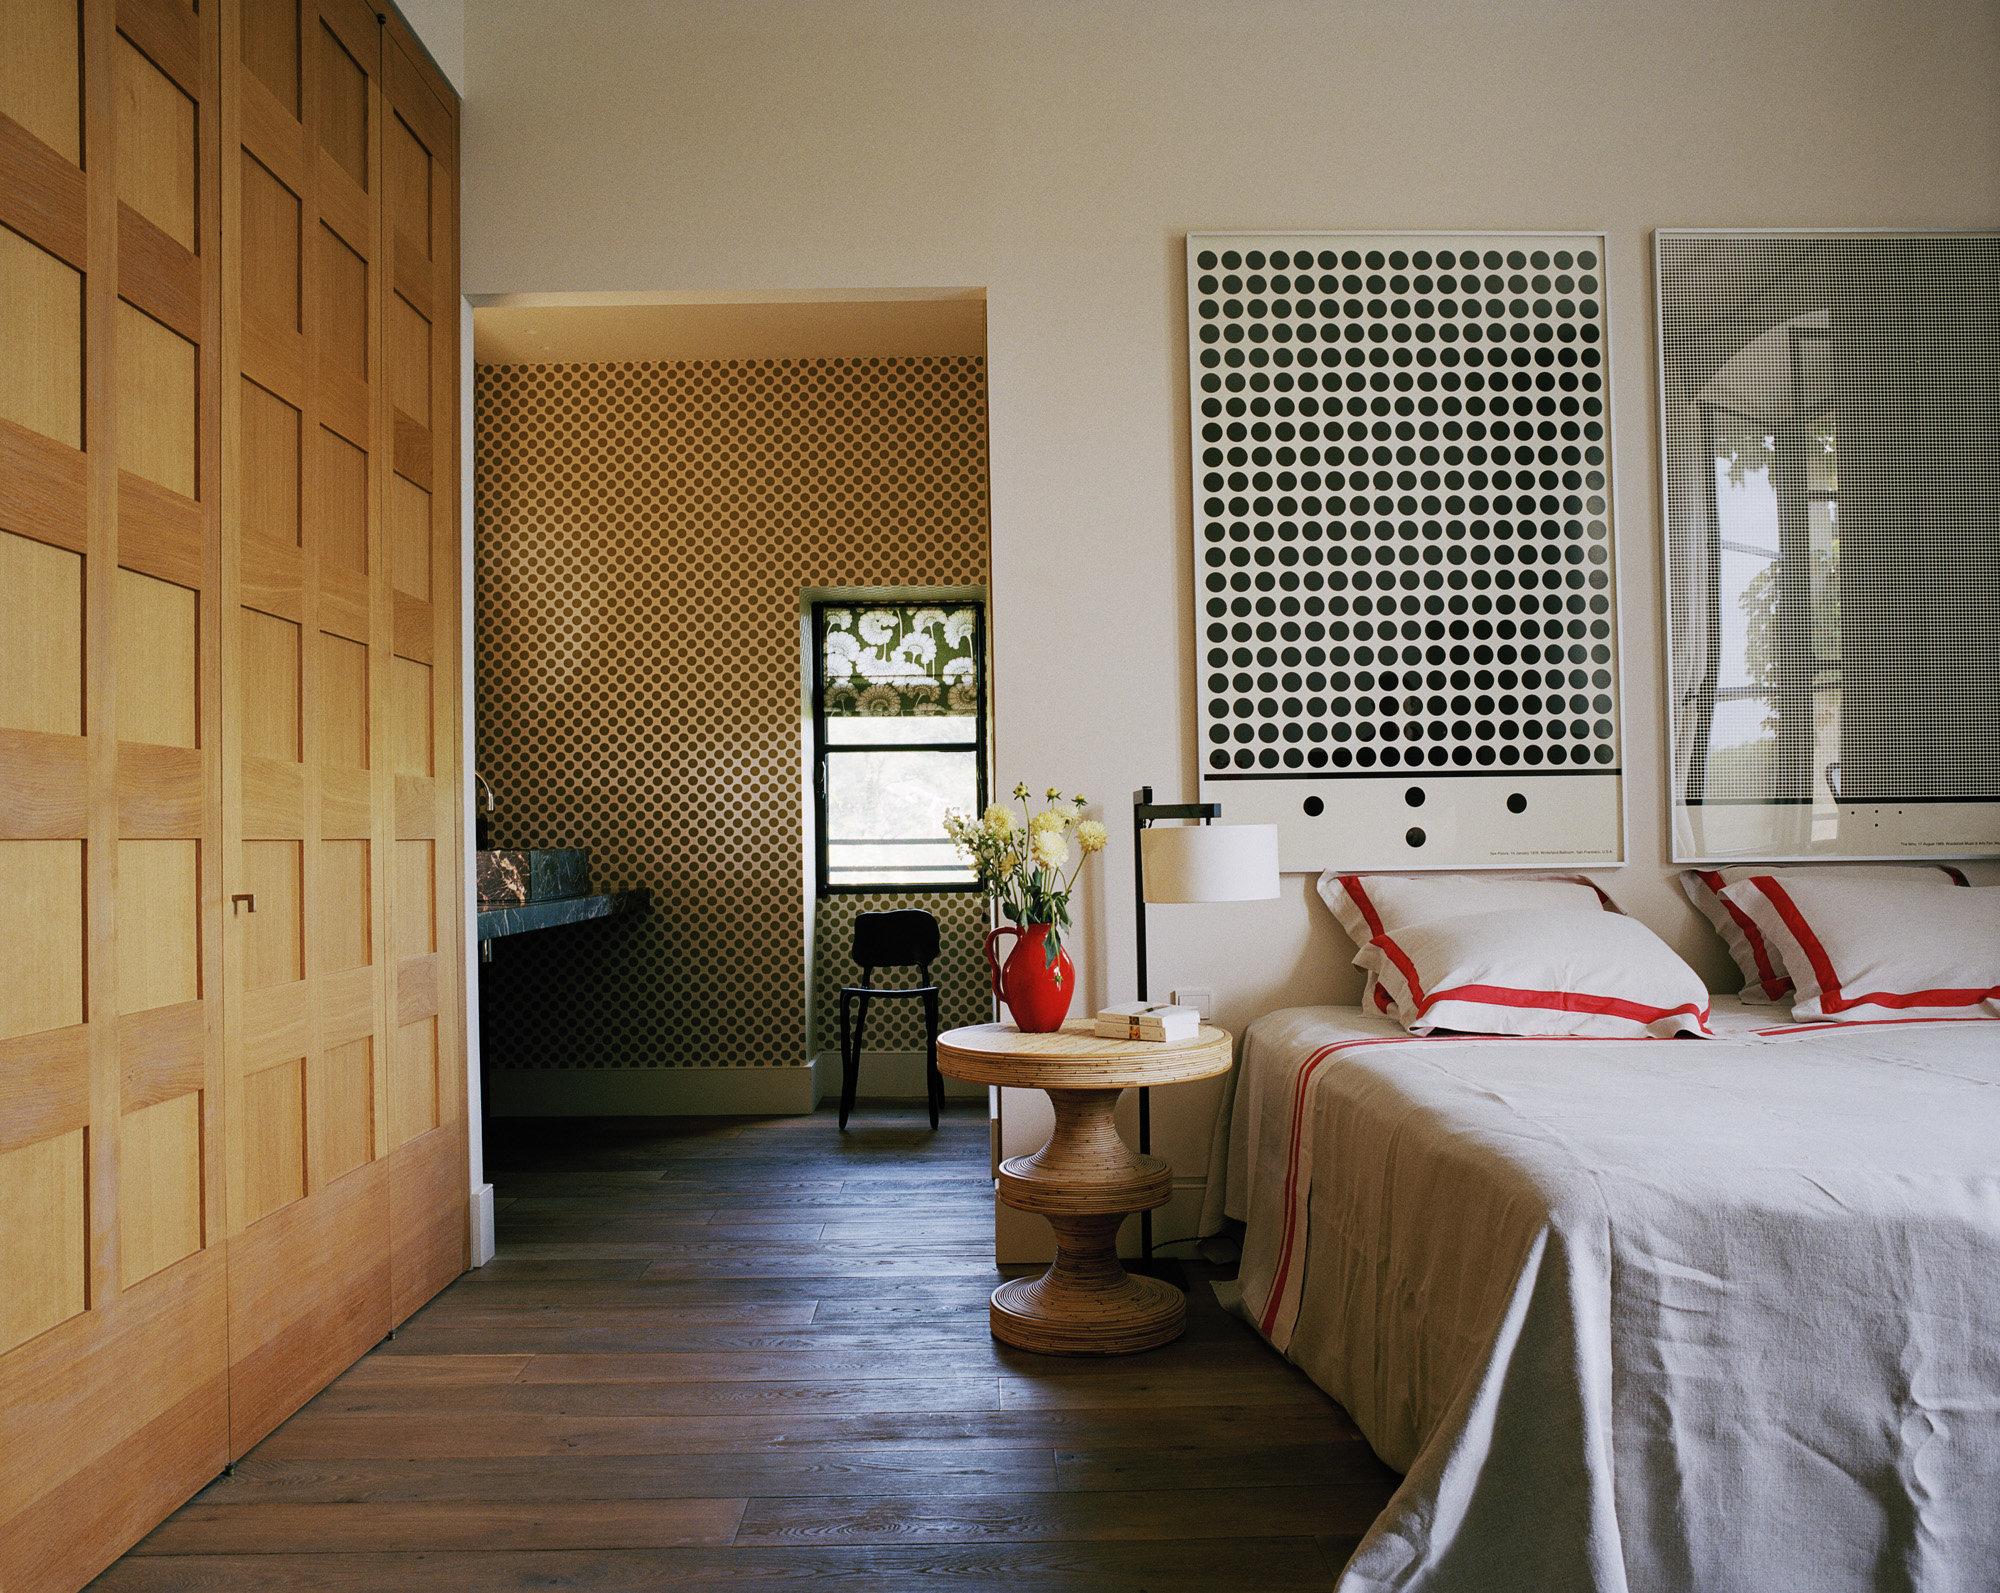 india_mahdavi_Villa-des-Alyscamps_2009_residential_Arles_architecture_design_interior_3-2000x1593.jpg